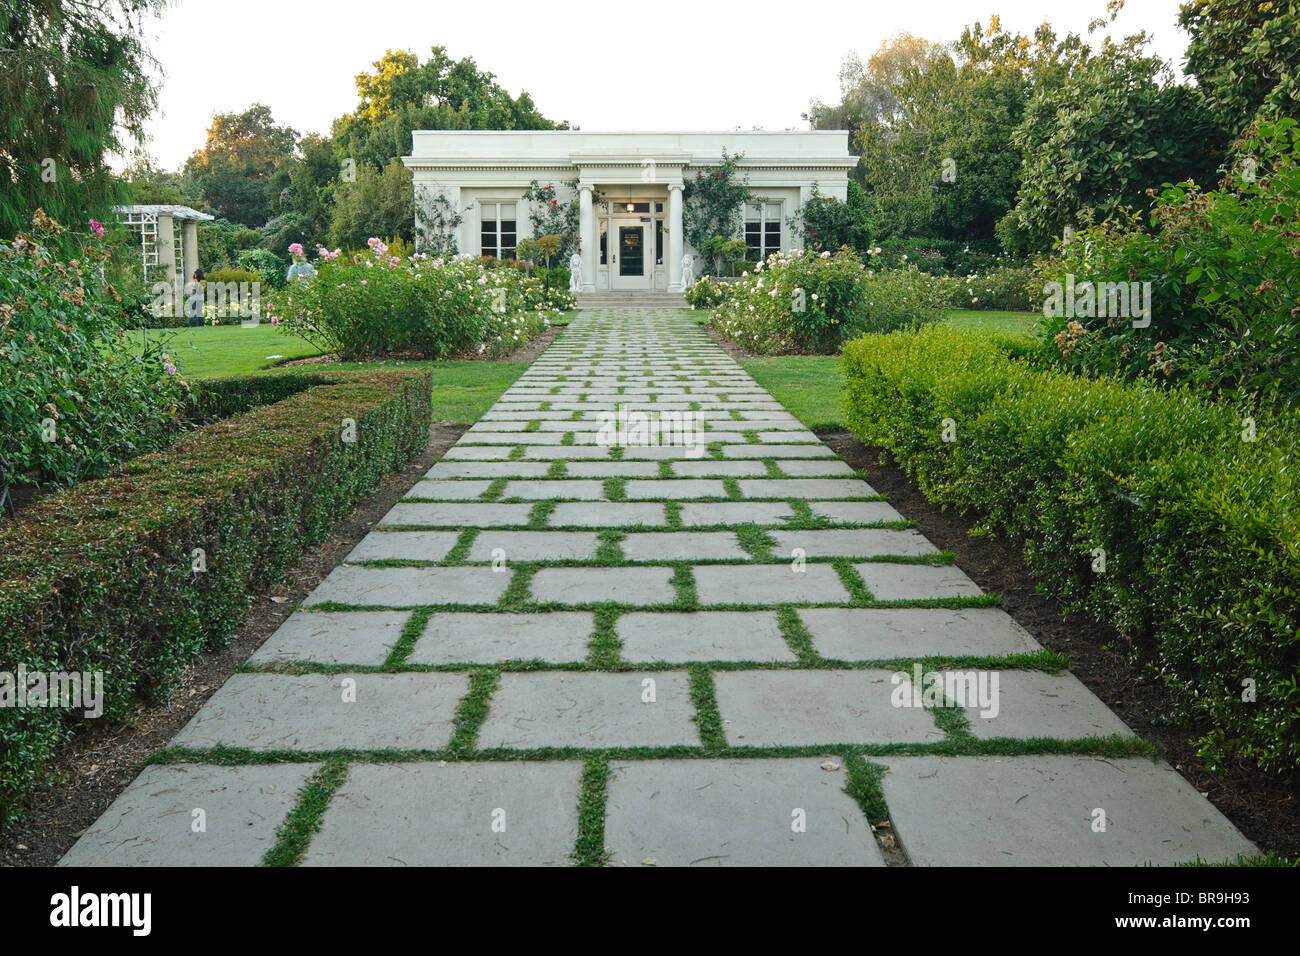 Beautiful walkway leading to the Tea Room. - Stock Image